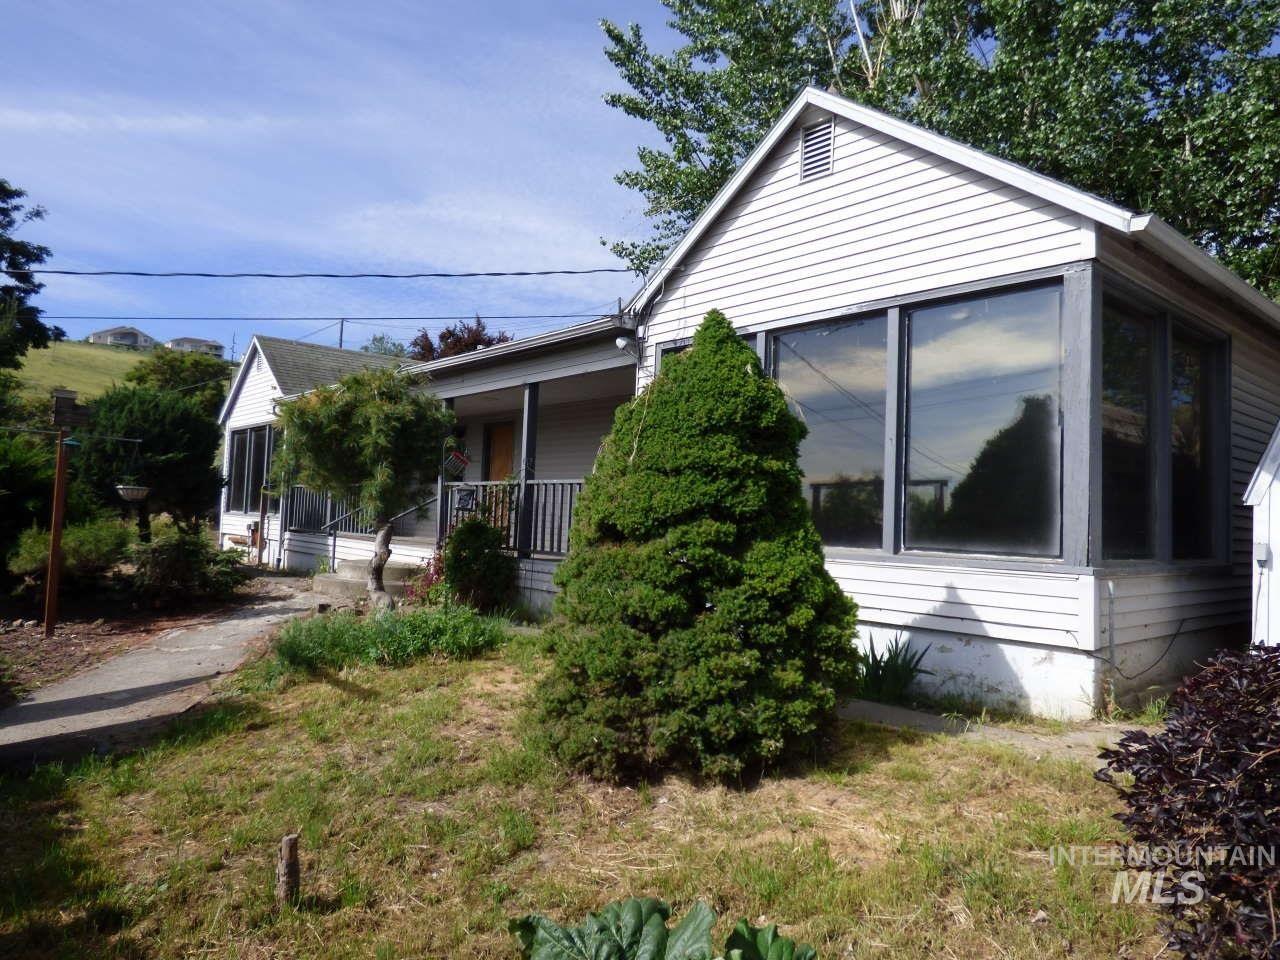 1570 15th Street, Clarkston, WV 99403 - MLS#: 98768412